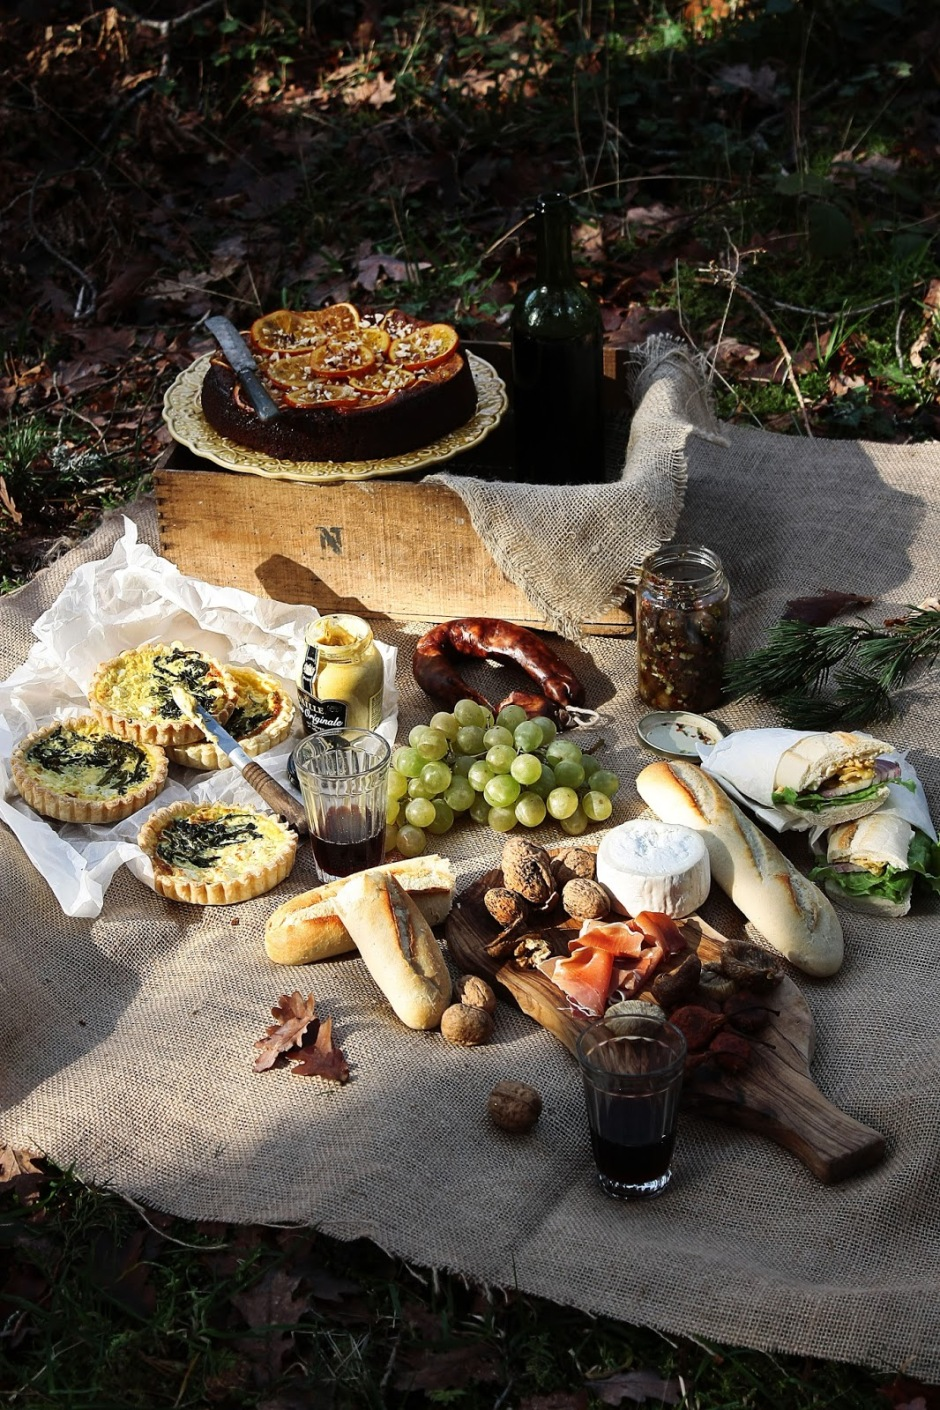 88b63-picnic